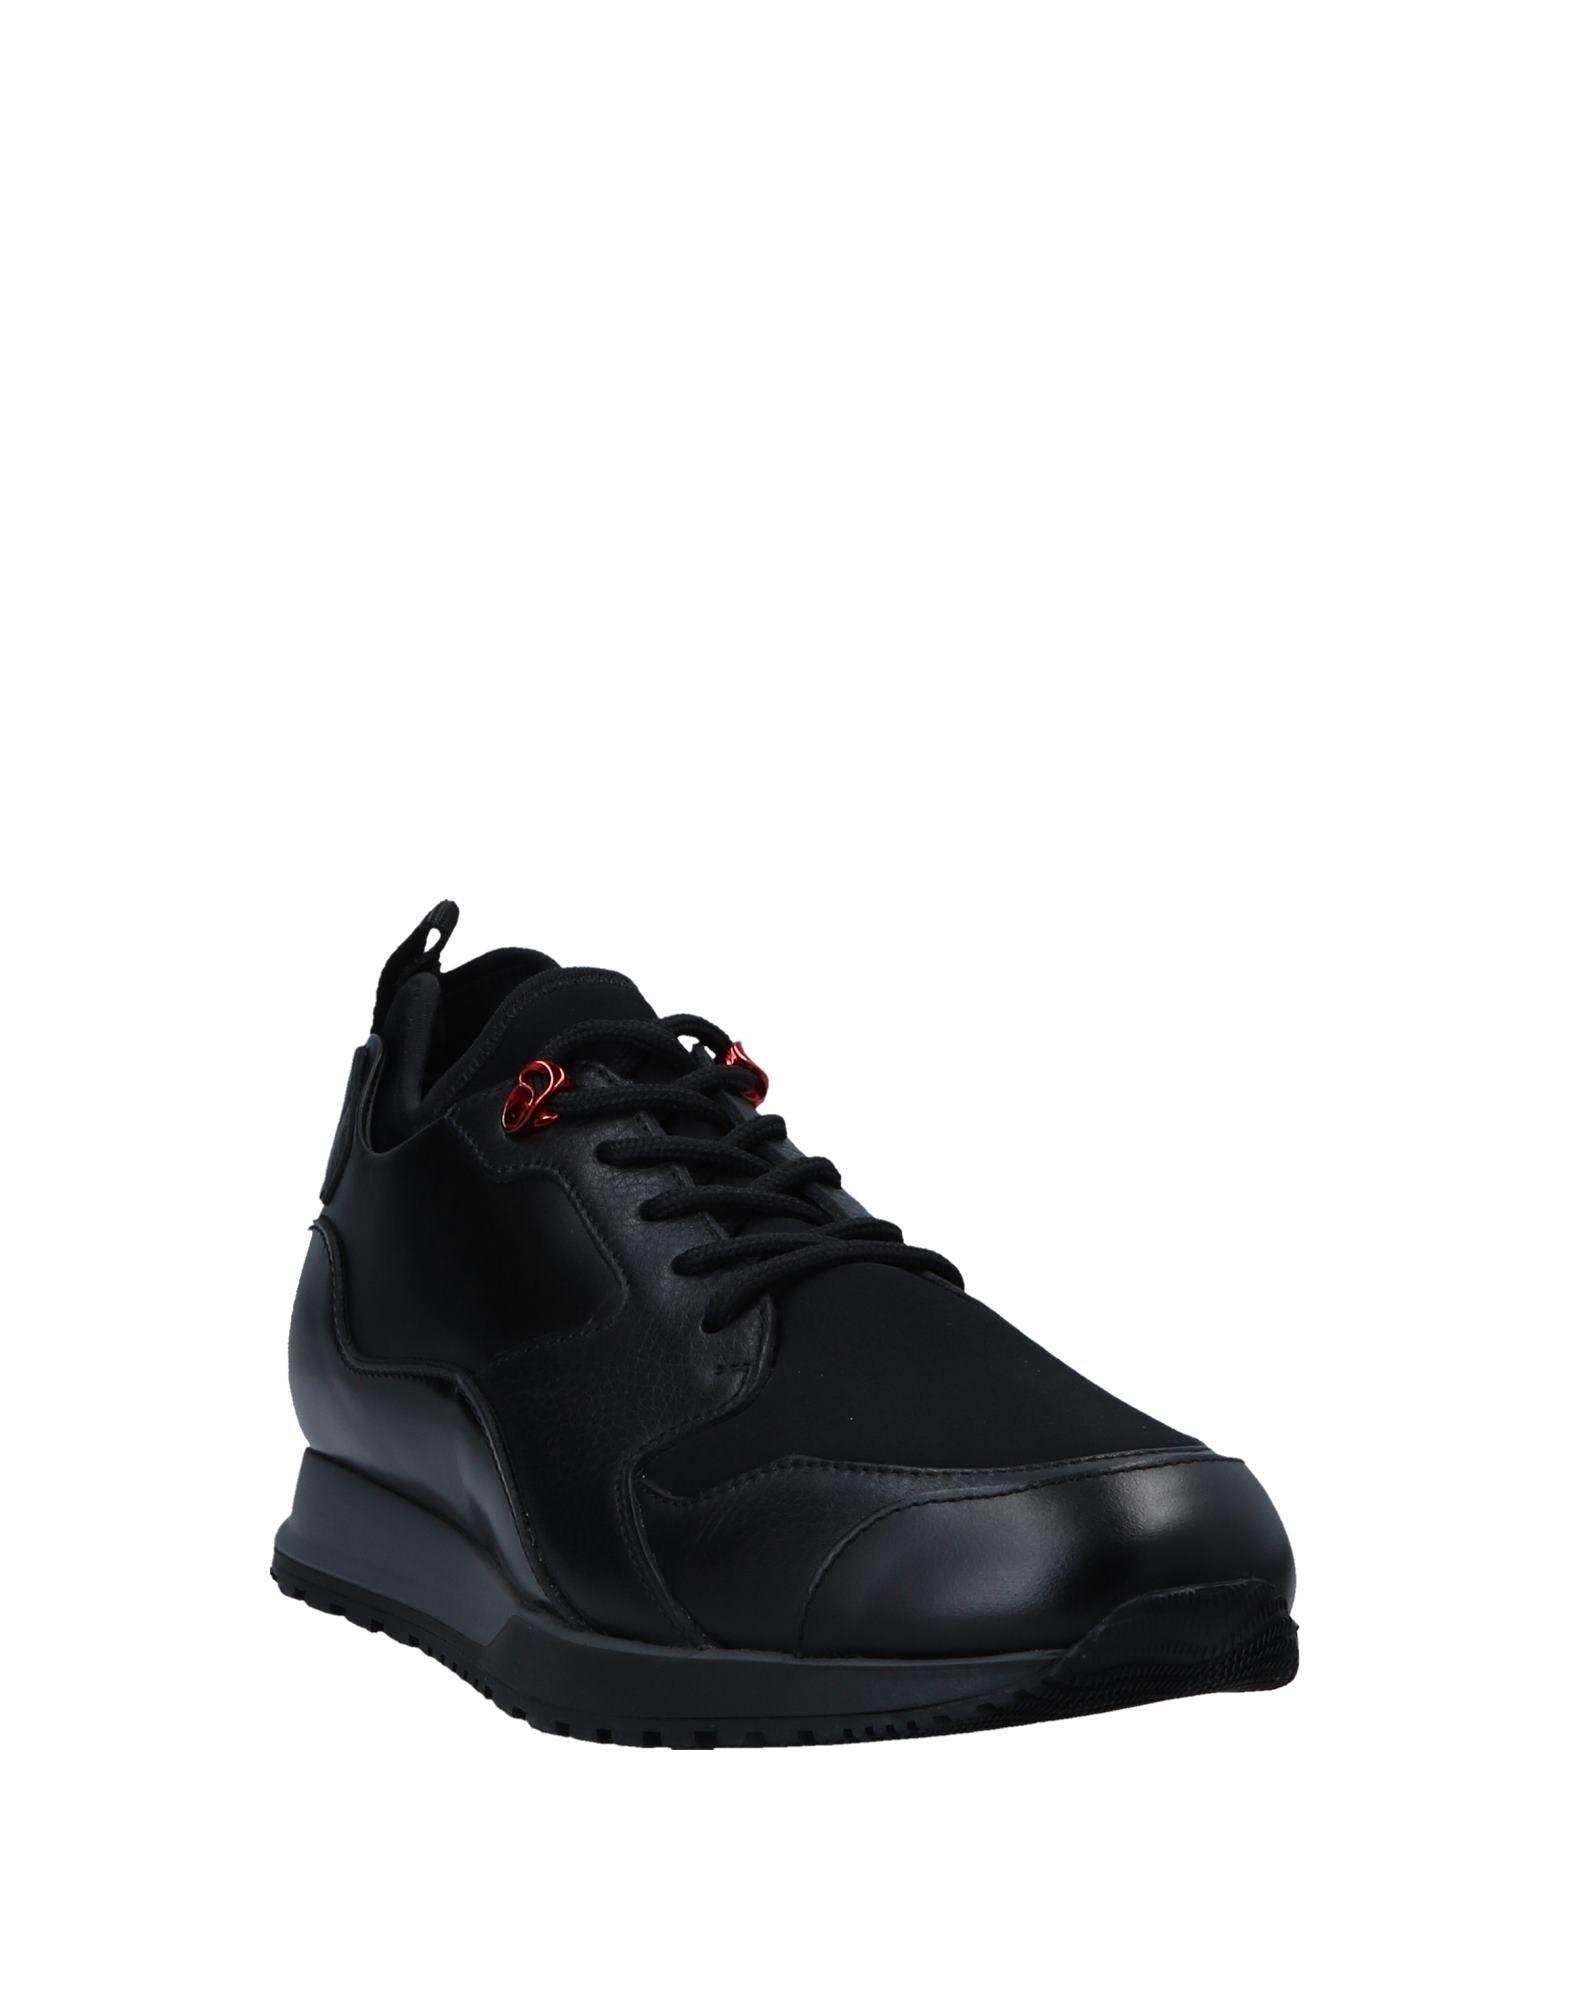 Hogan Sneakers Herren  11559399TV Gute Qualität beliebte Schuhe